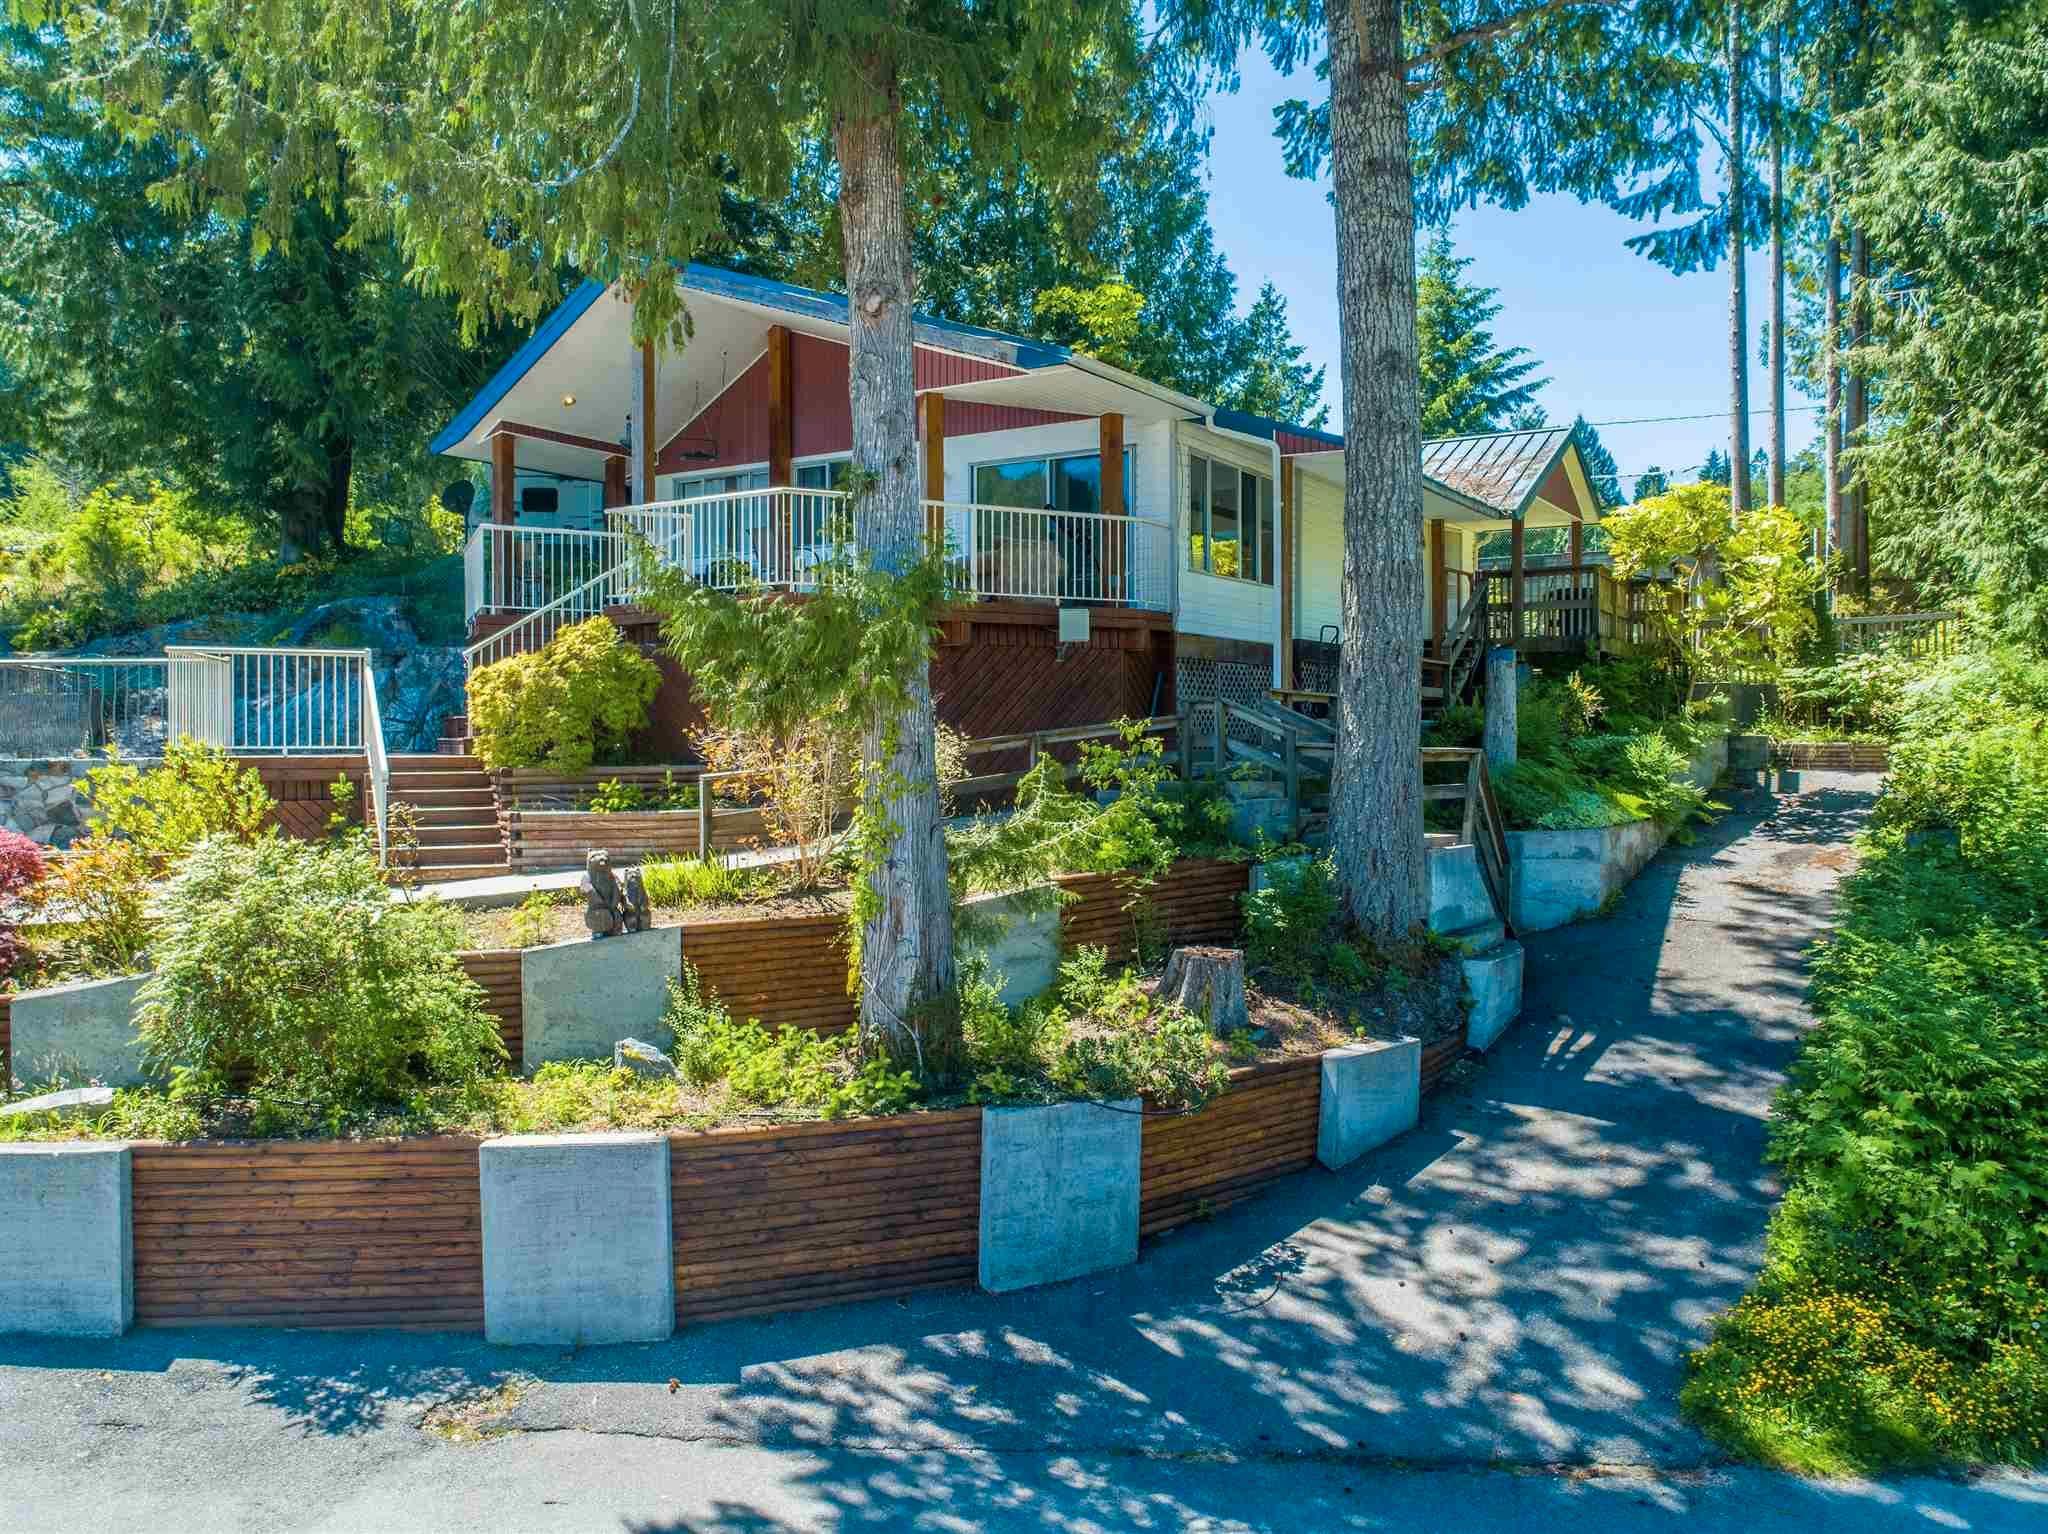 Photo 13: Photos: 6781 BATHGATE Road in Egmont: Pender Harbour Egmont House for sale (Sunshine Coast)  : MLS®# R2593981